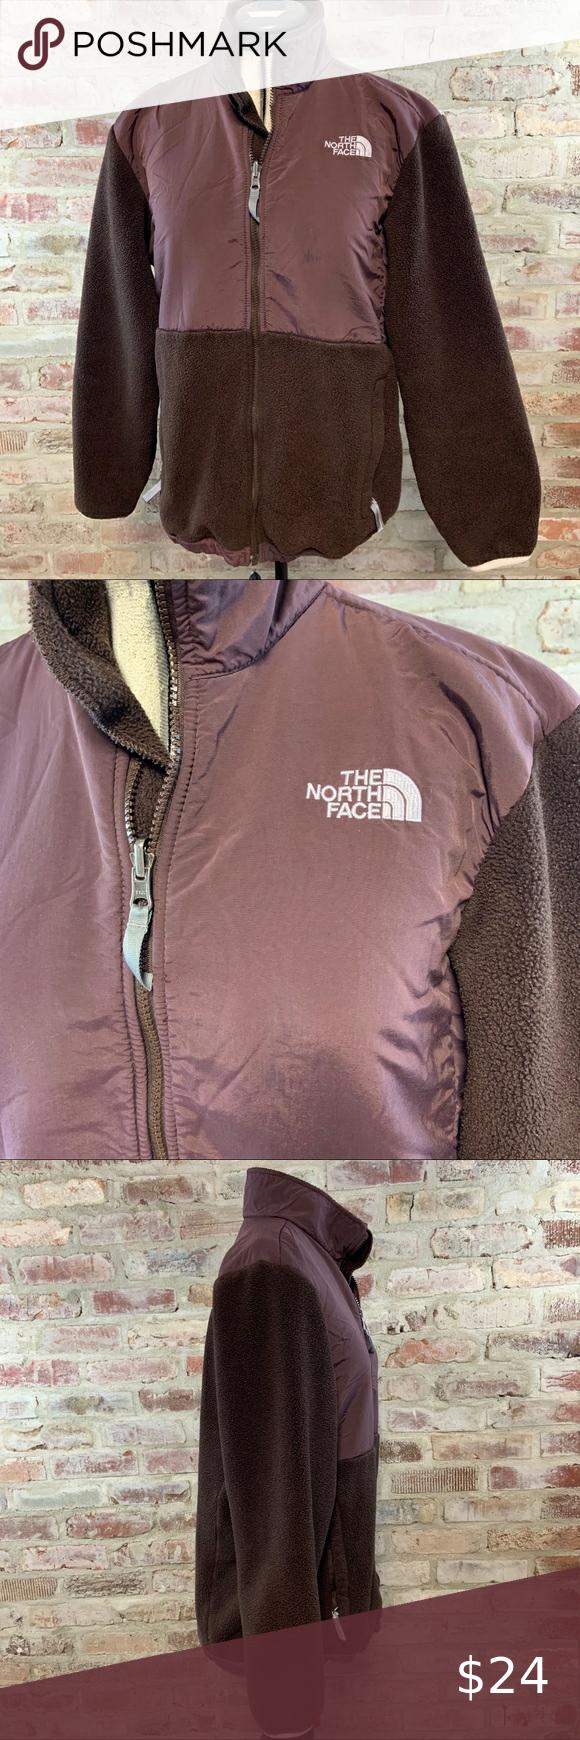 North Face Girls Burgundy Fleece Jacket Girls North Face Jacket North Face Girls Fleece Jacket [ 1740 x 580 Pixel ]